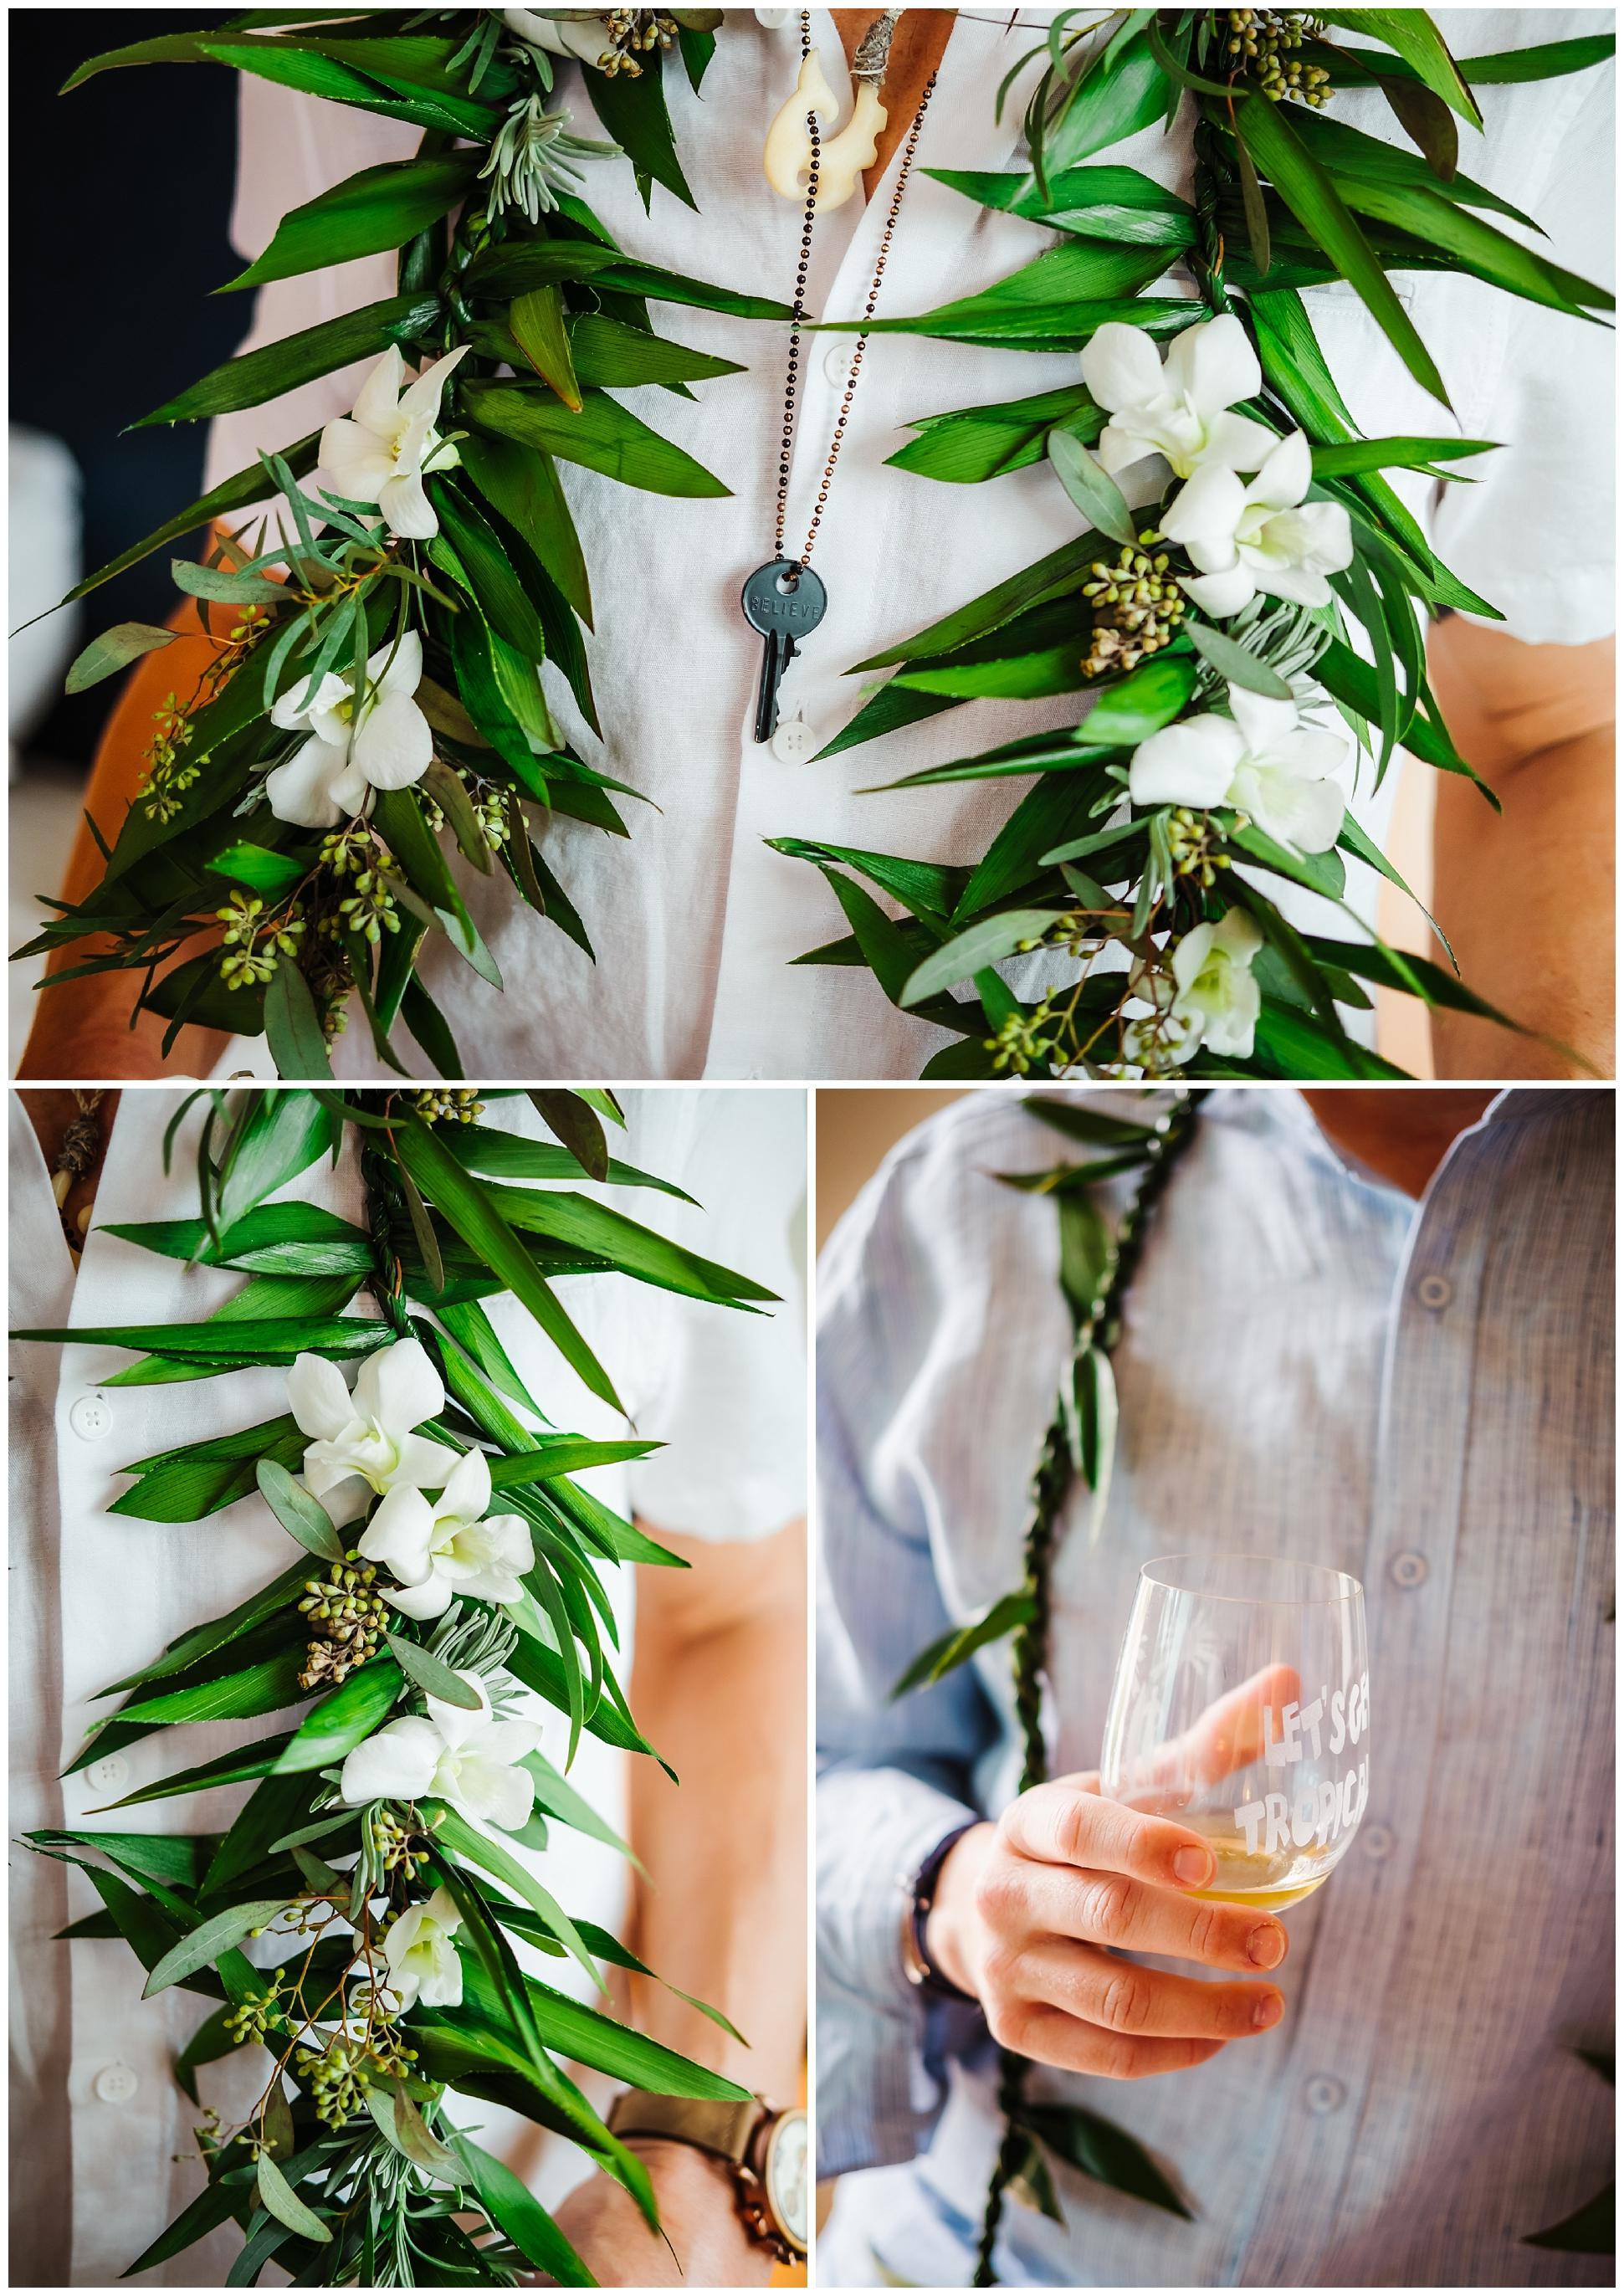 tampa-bay-wedding-photographer-barefoot-post-card-inn-tropical-hawaiin-lei-pink-pineapples-flower-crown_0133.jpg